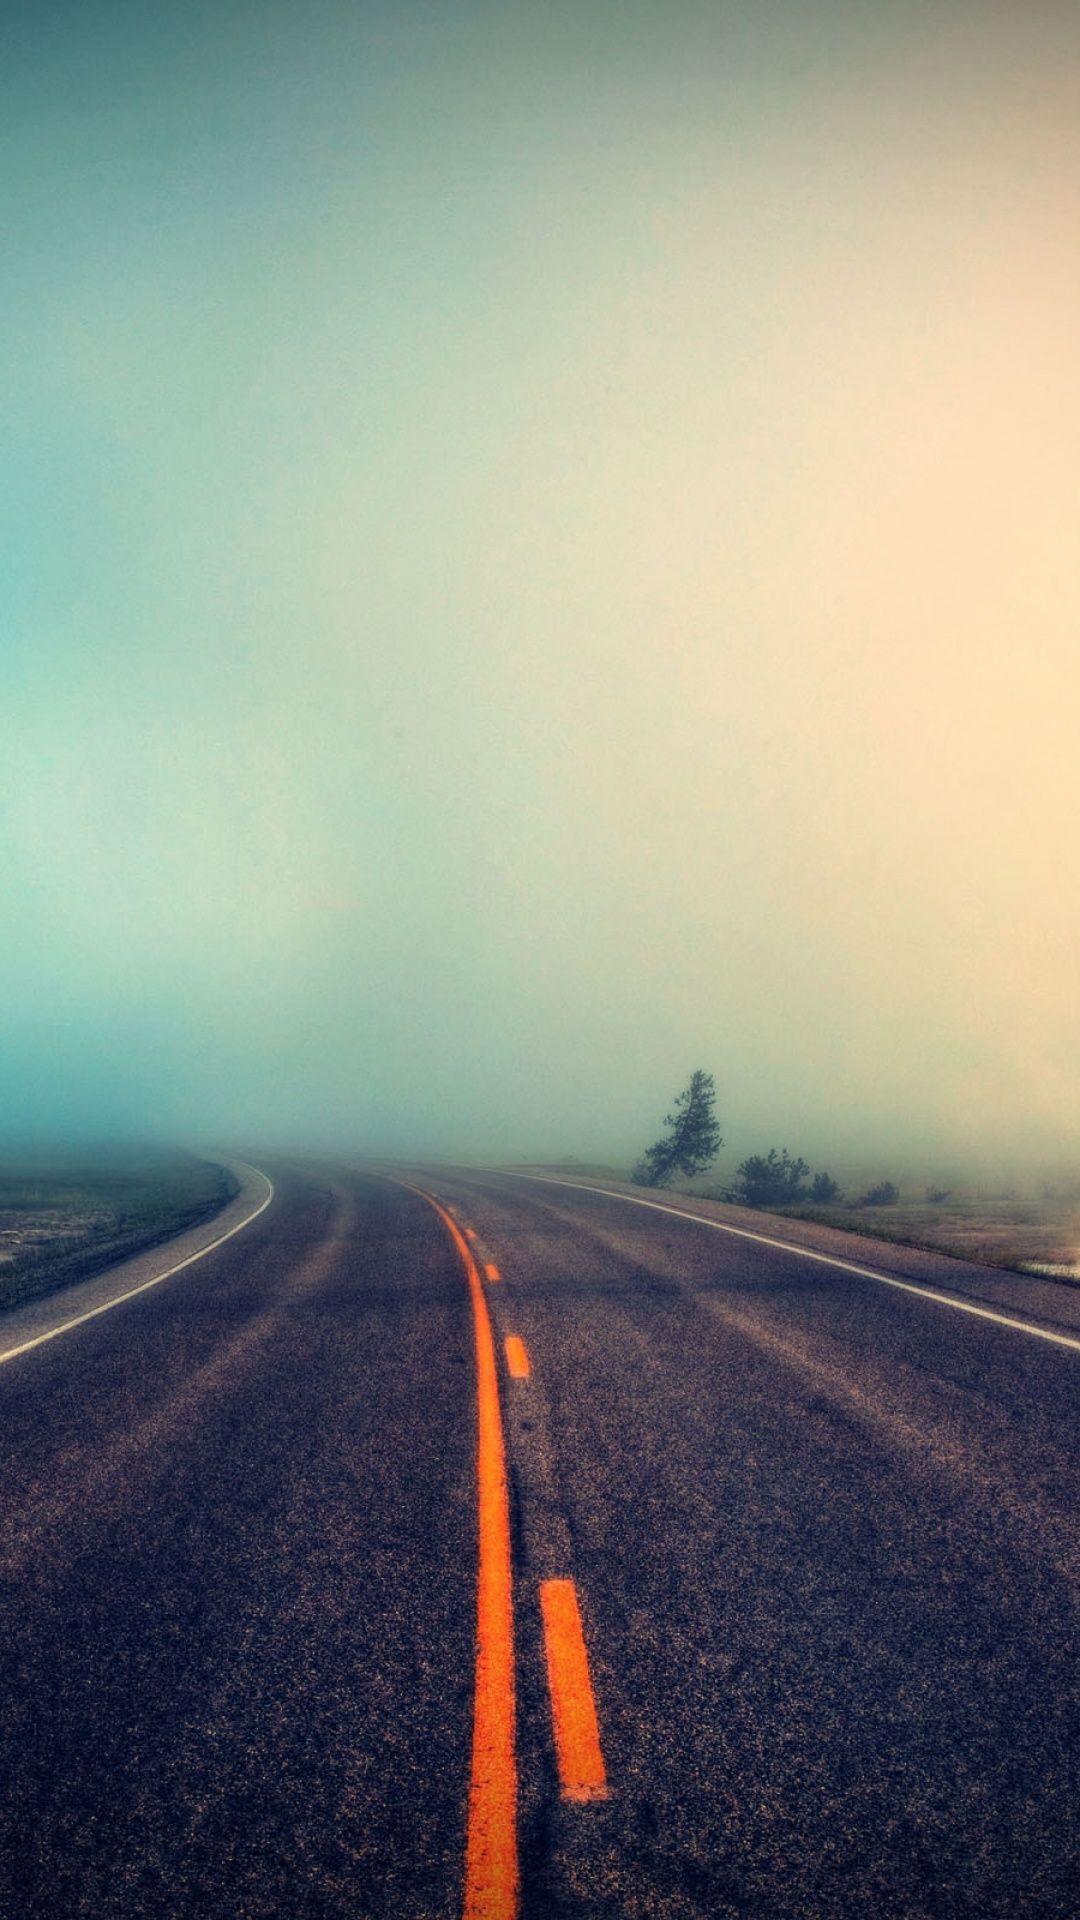 Empty Road S4 Wallpaper | ID: 22131